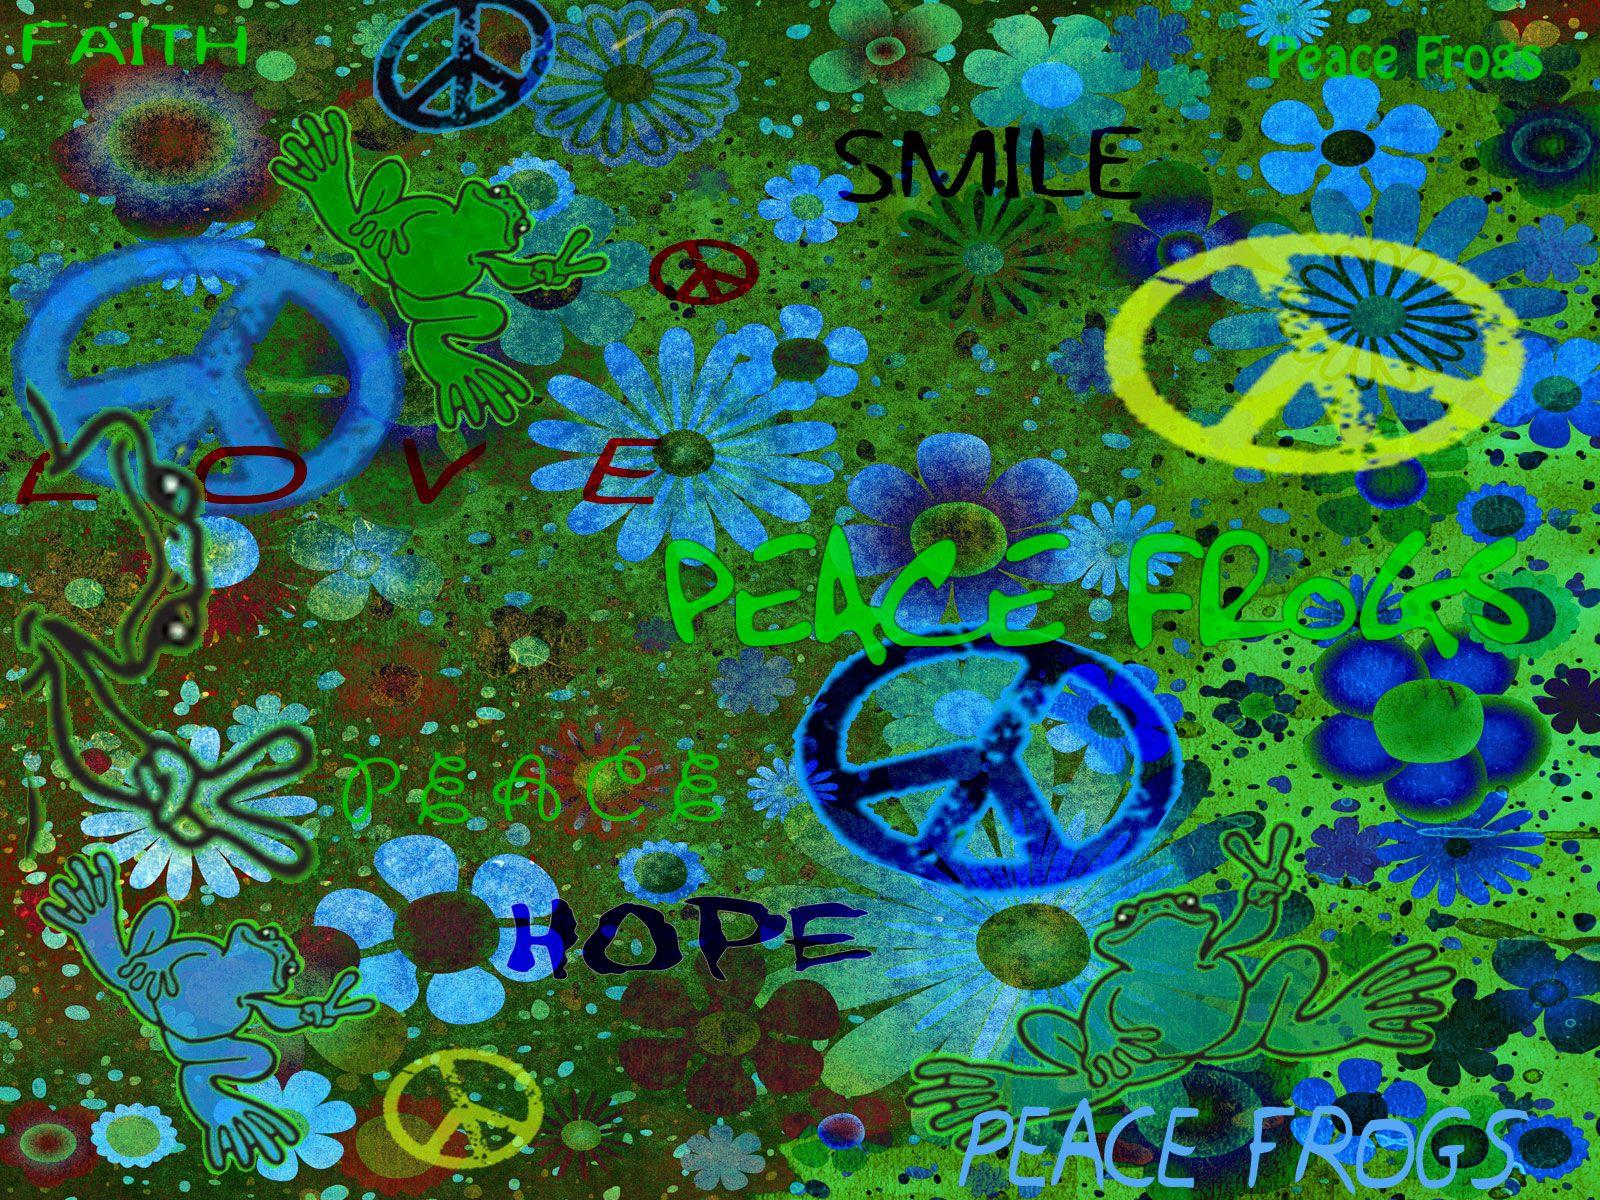 Free Wallpaper Downloads Peace Frog Wallpaper Free Download Peace Art